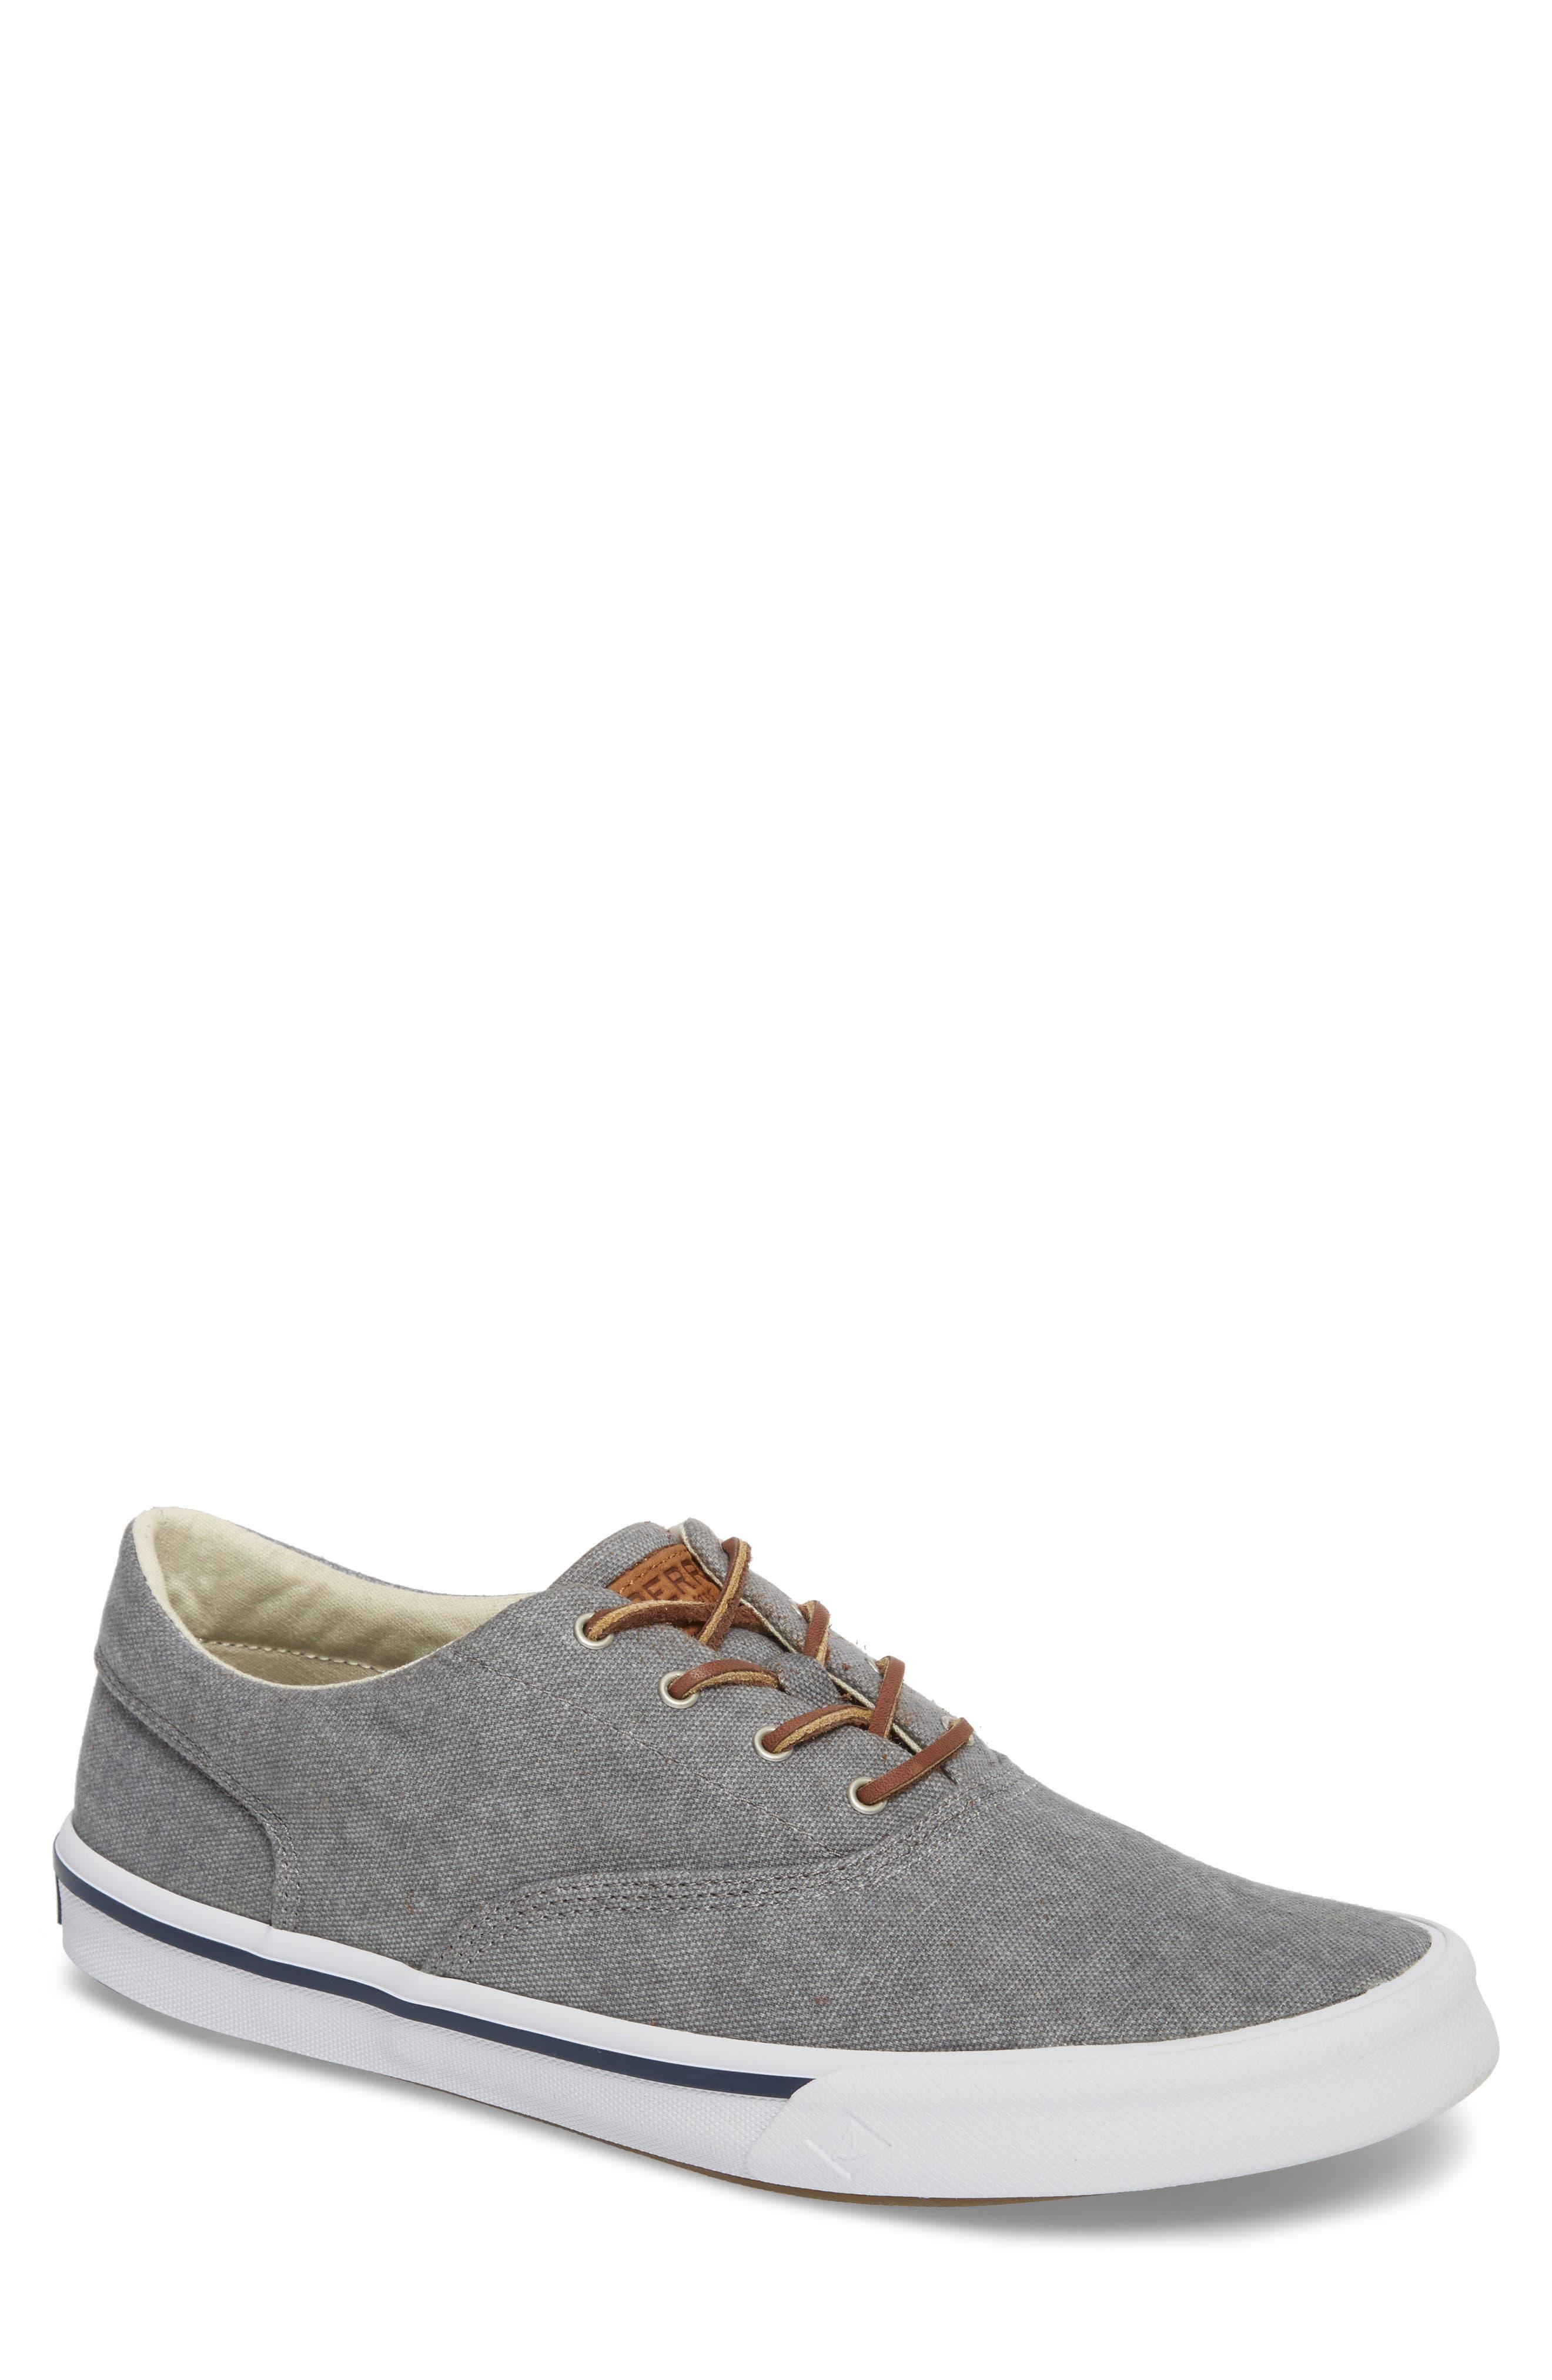 SPERRY Striper 2 CVO Sneaker, Main, color, 020